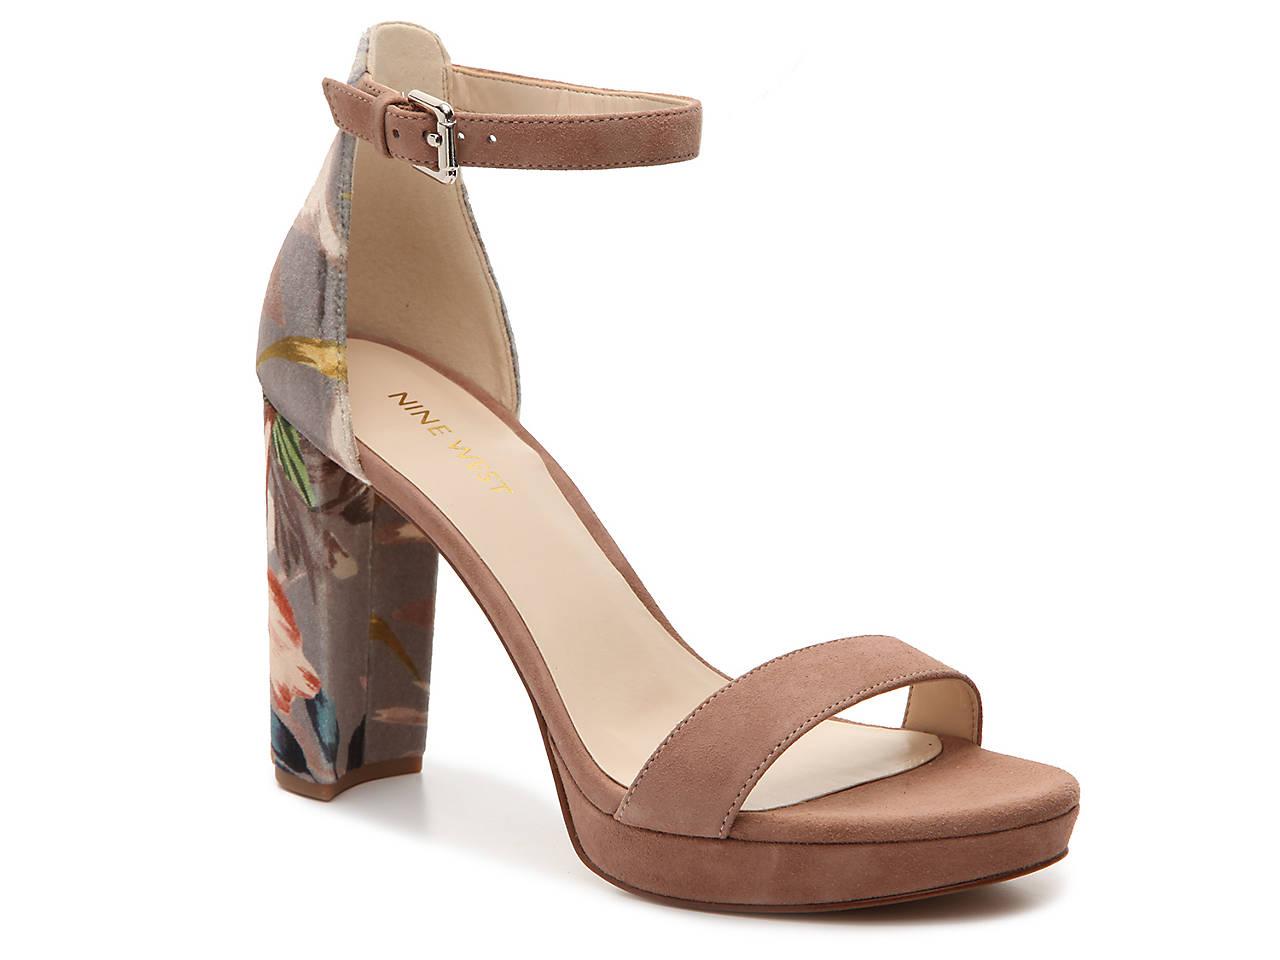 dcddd35aabe2 Nine West Dempsey Platform Sandal Women s Shoes